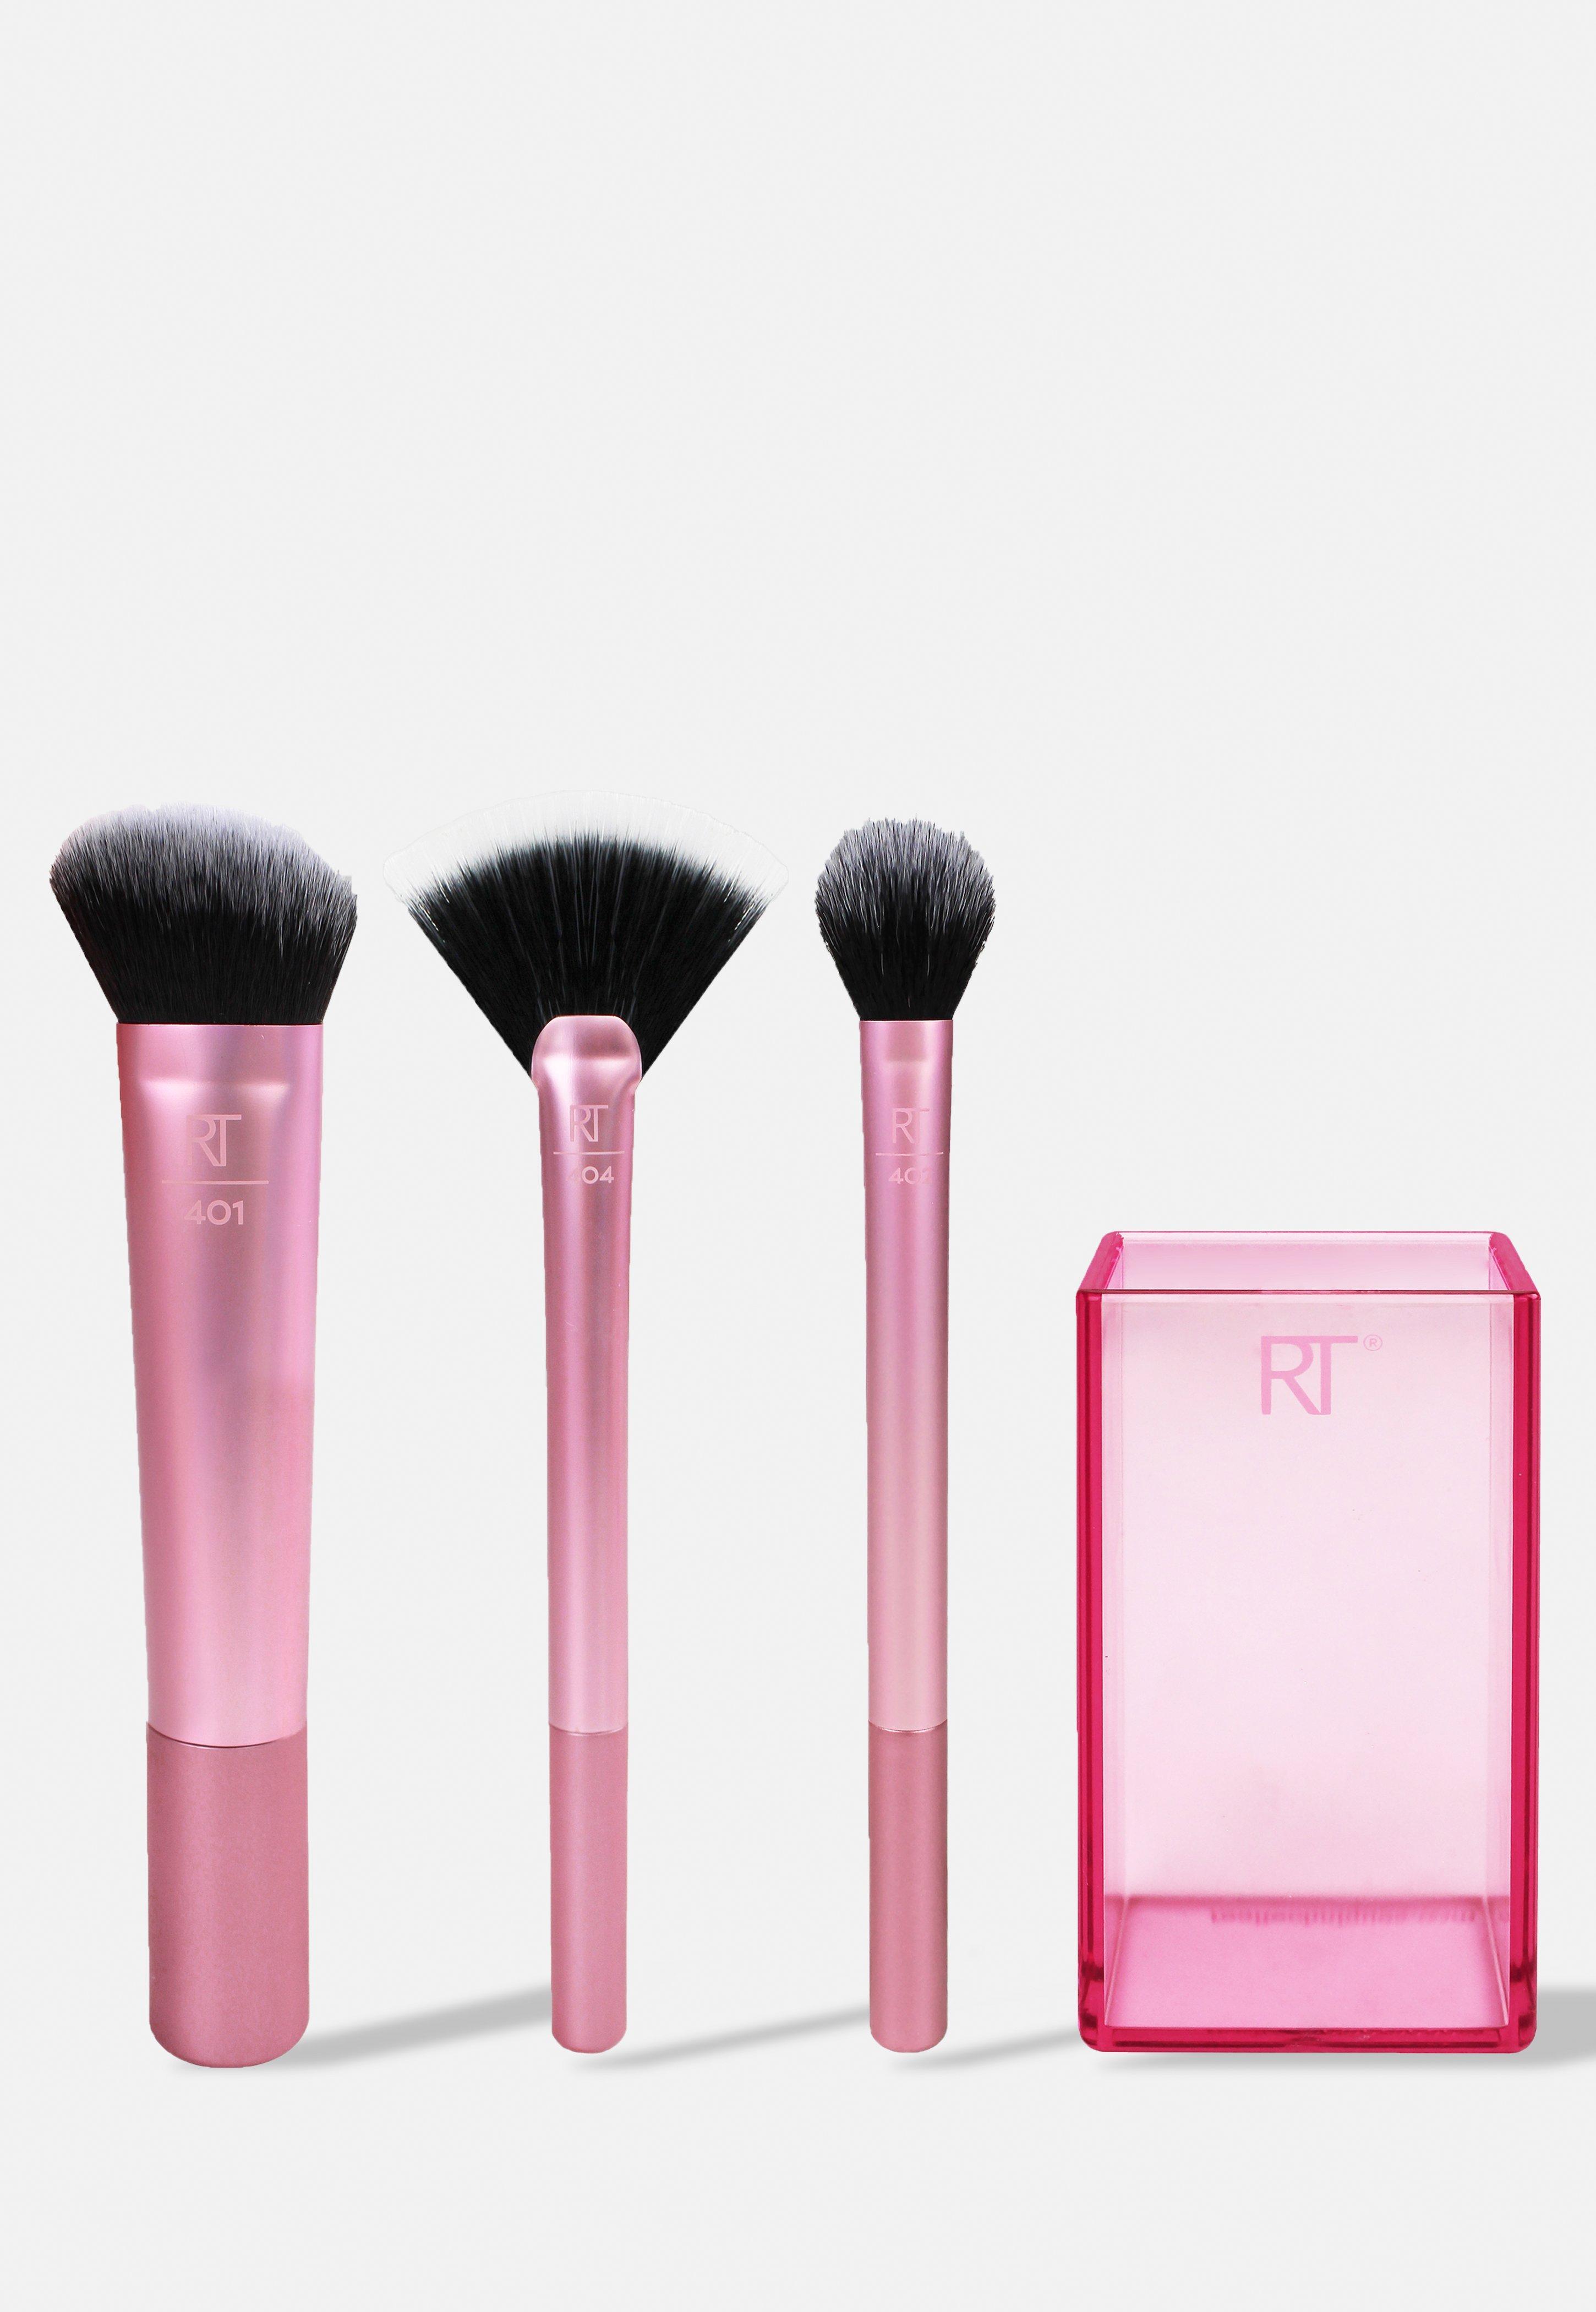 Real Techniques Sculpting Makeup Brush